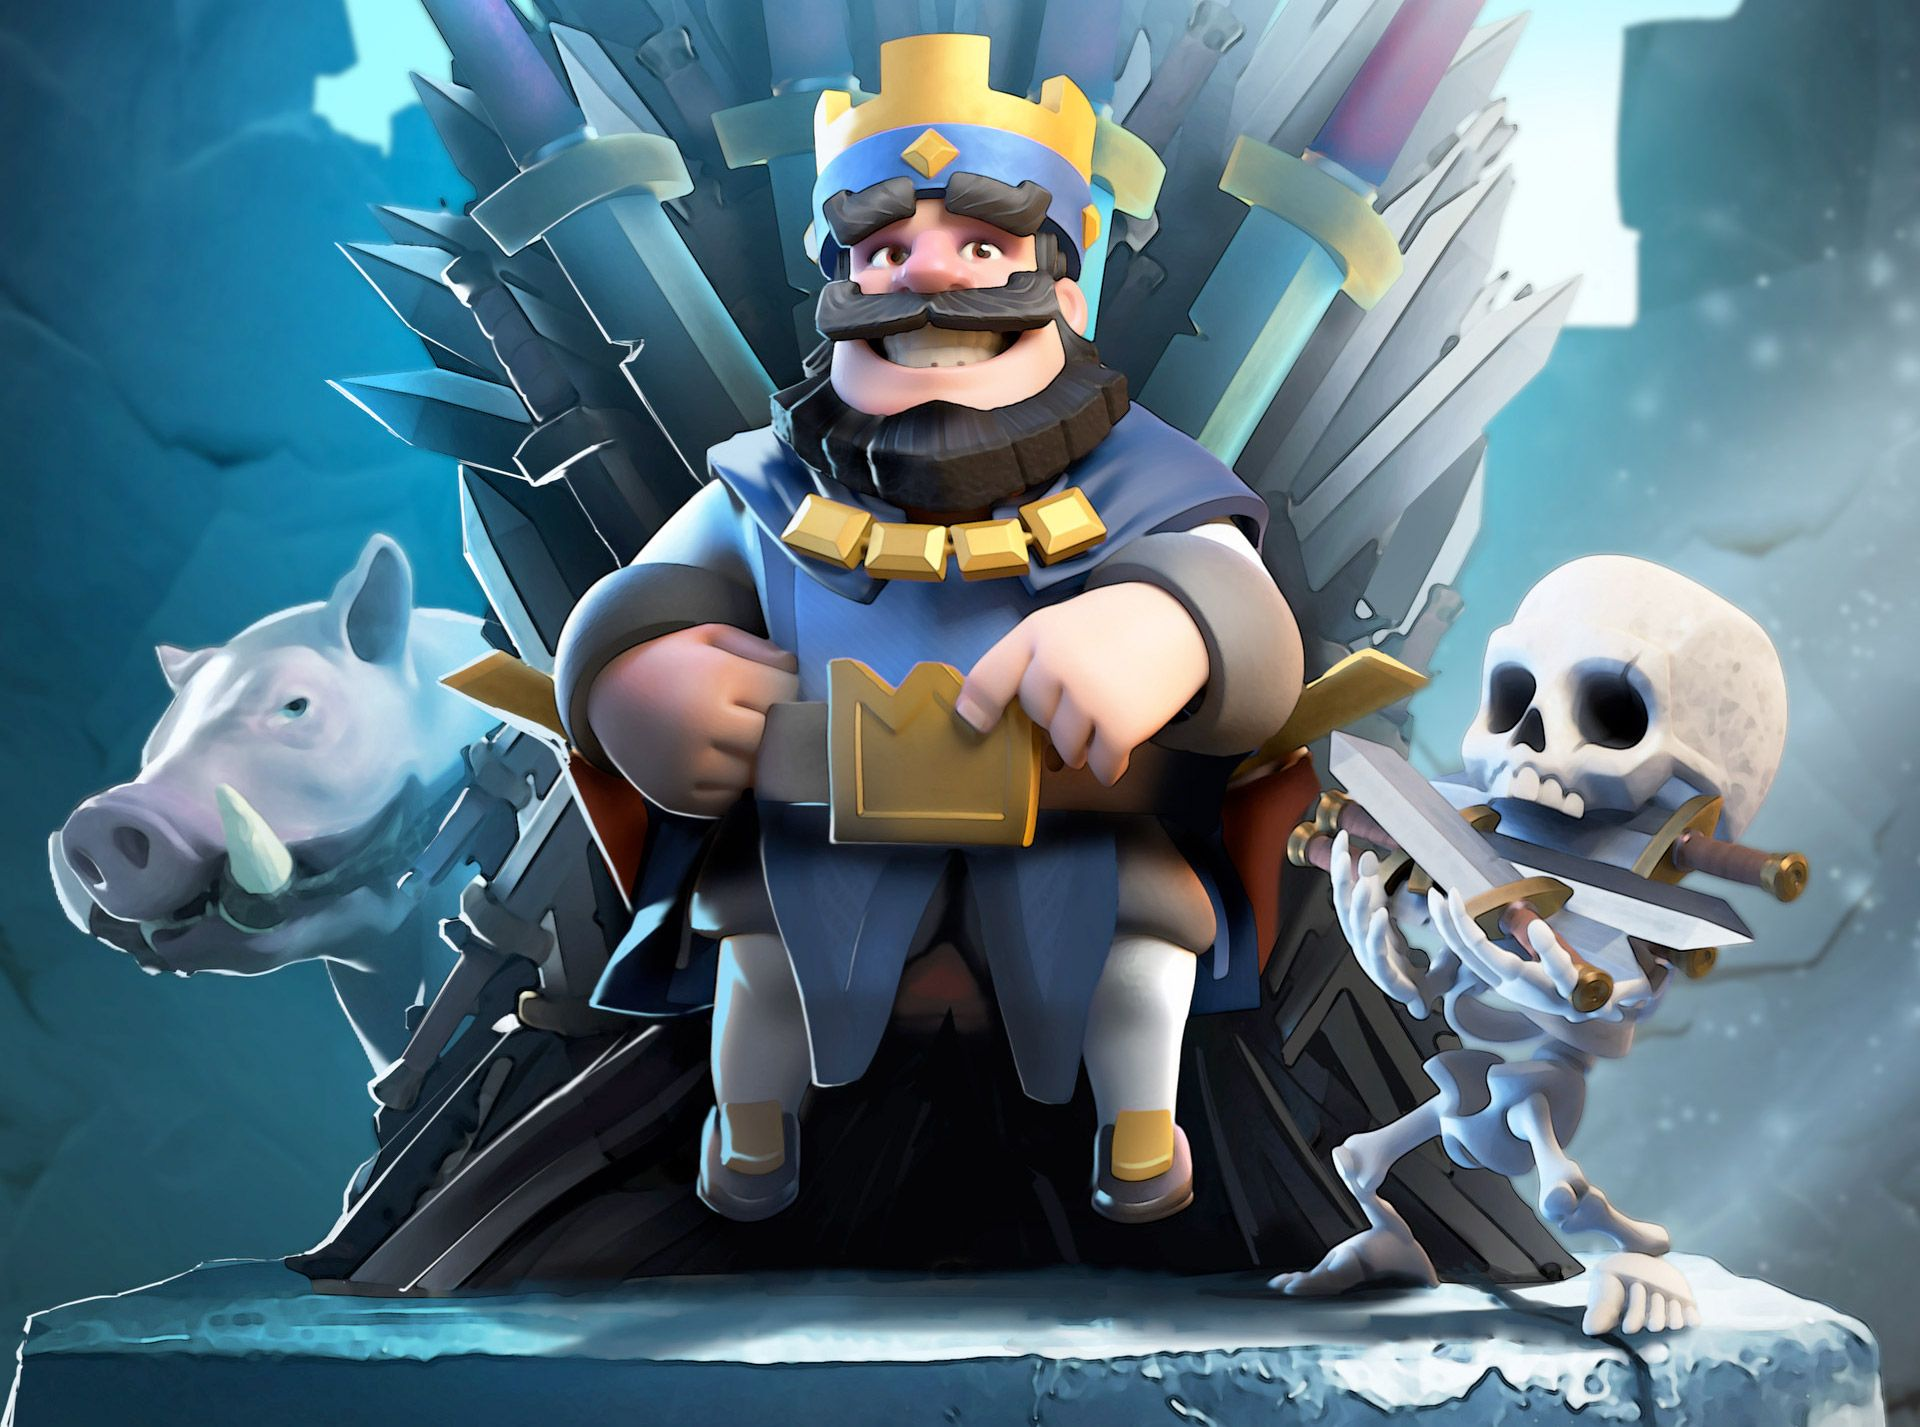 4k Clash Royal Clash Royale Blue King Hd Hd Games 4k Wallpapers Images Clash Royale Wallpaper Royal Wallpaper Clash Royale